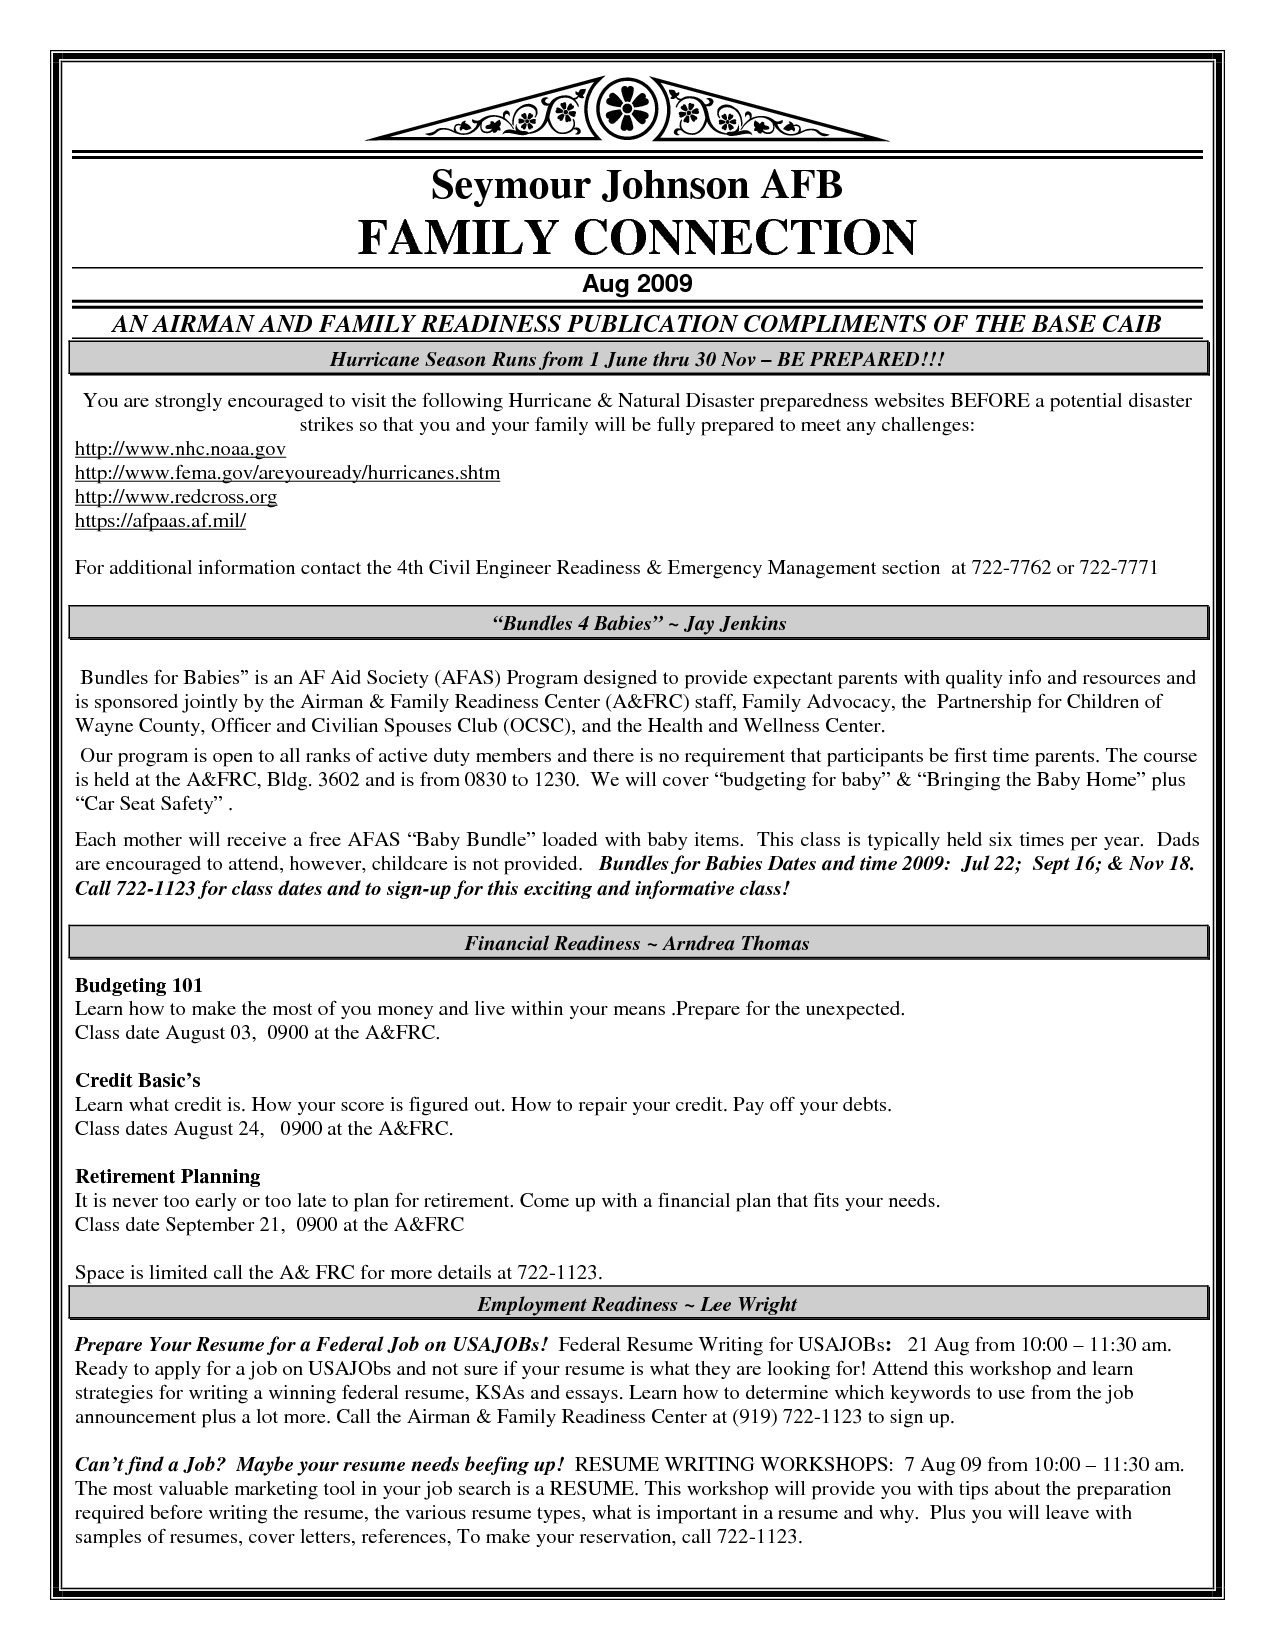 Resume Printable Brilliant Ideas Free Templates And Printing Pretty - Free Printable Resume